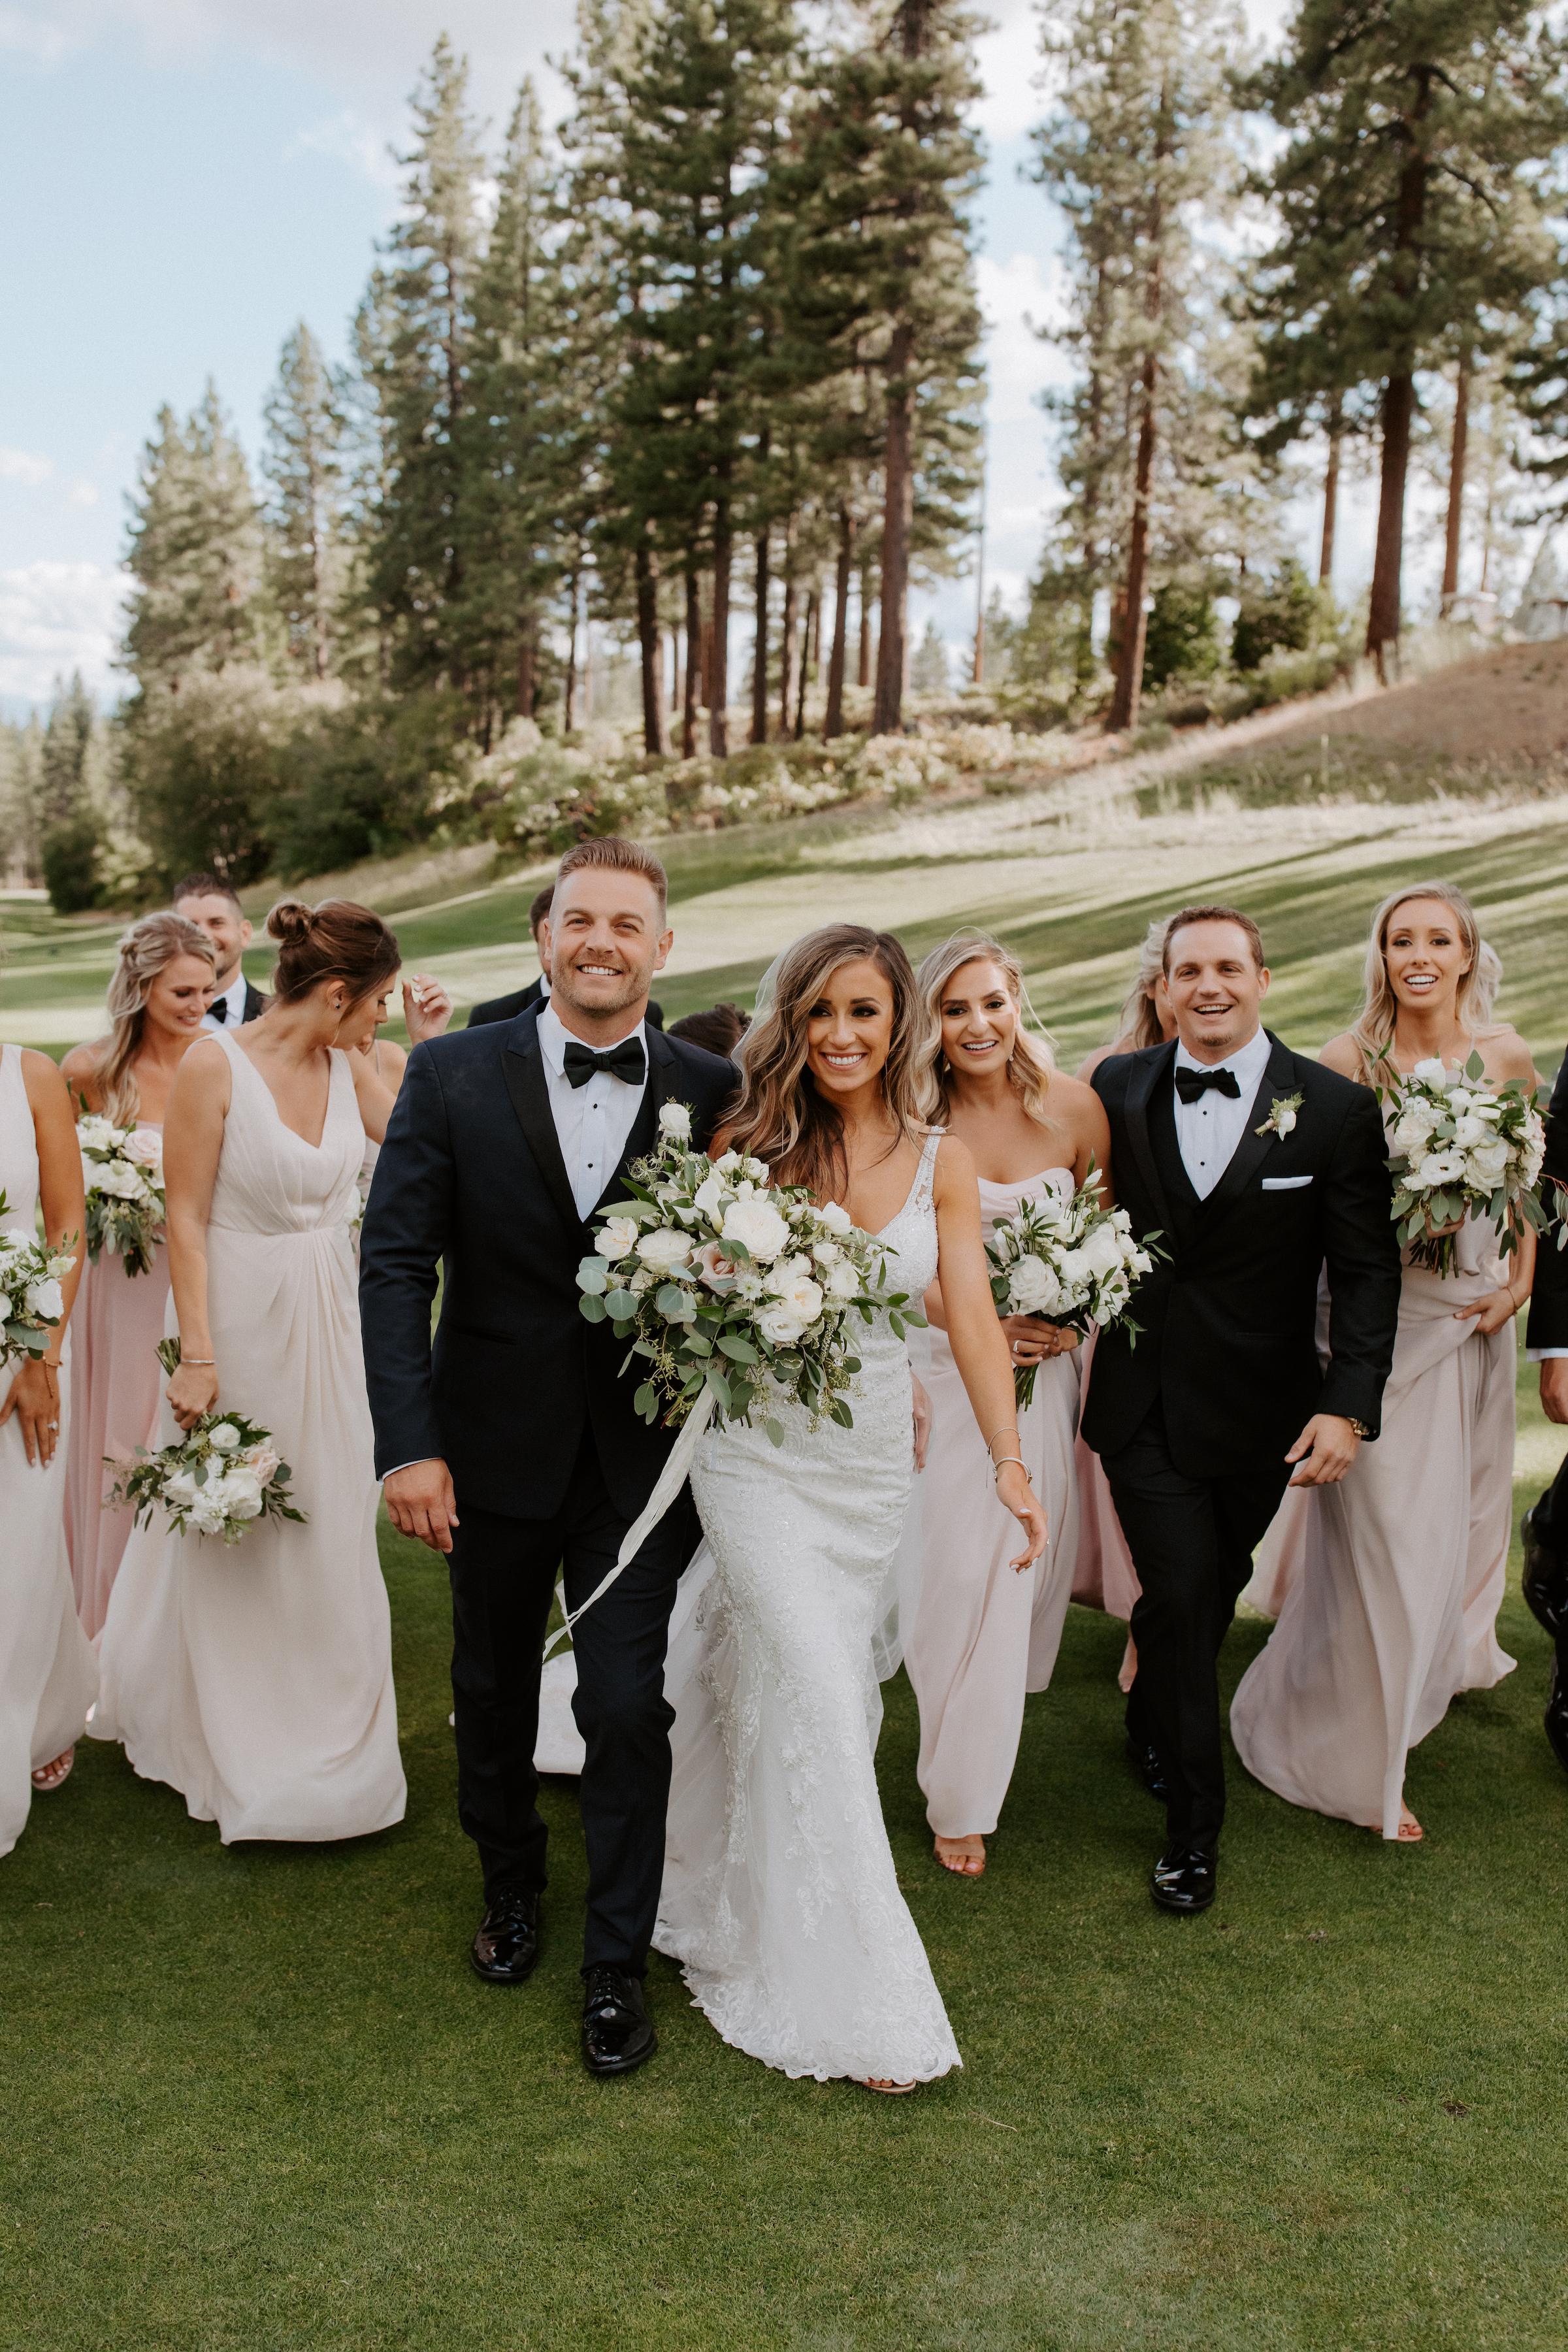 Neutral Toned Timeless Lake Tahoe Wedding Kay Kroshus12